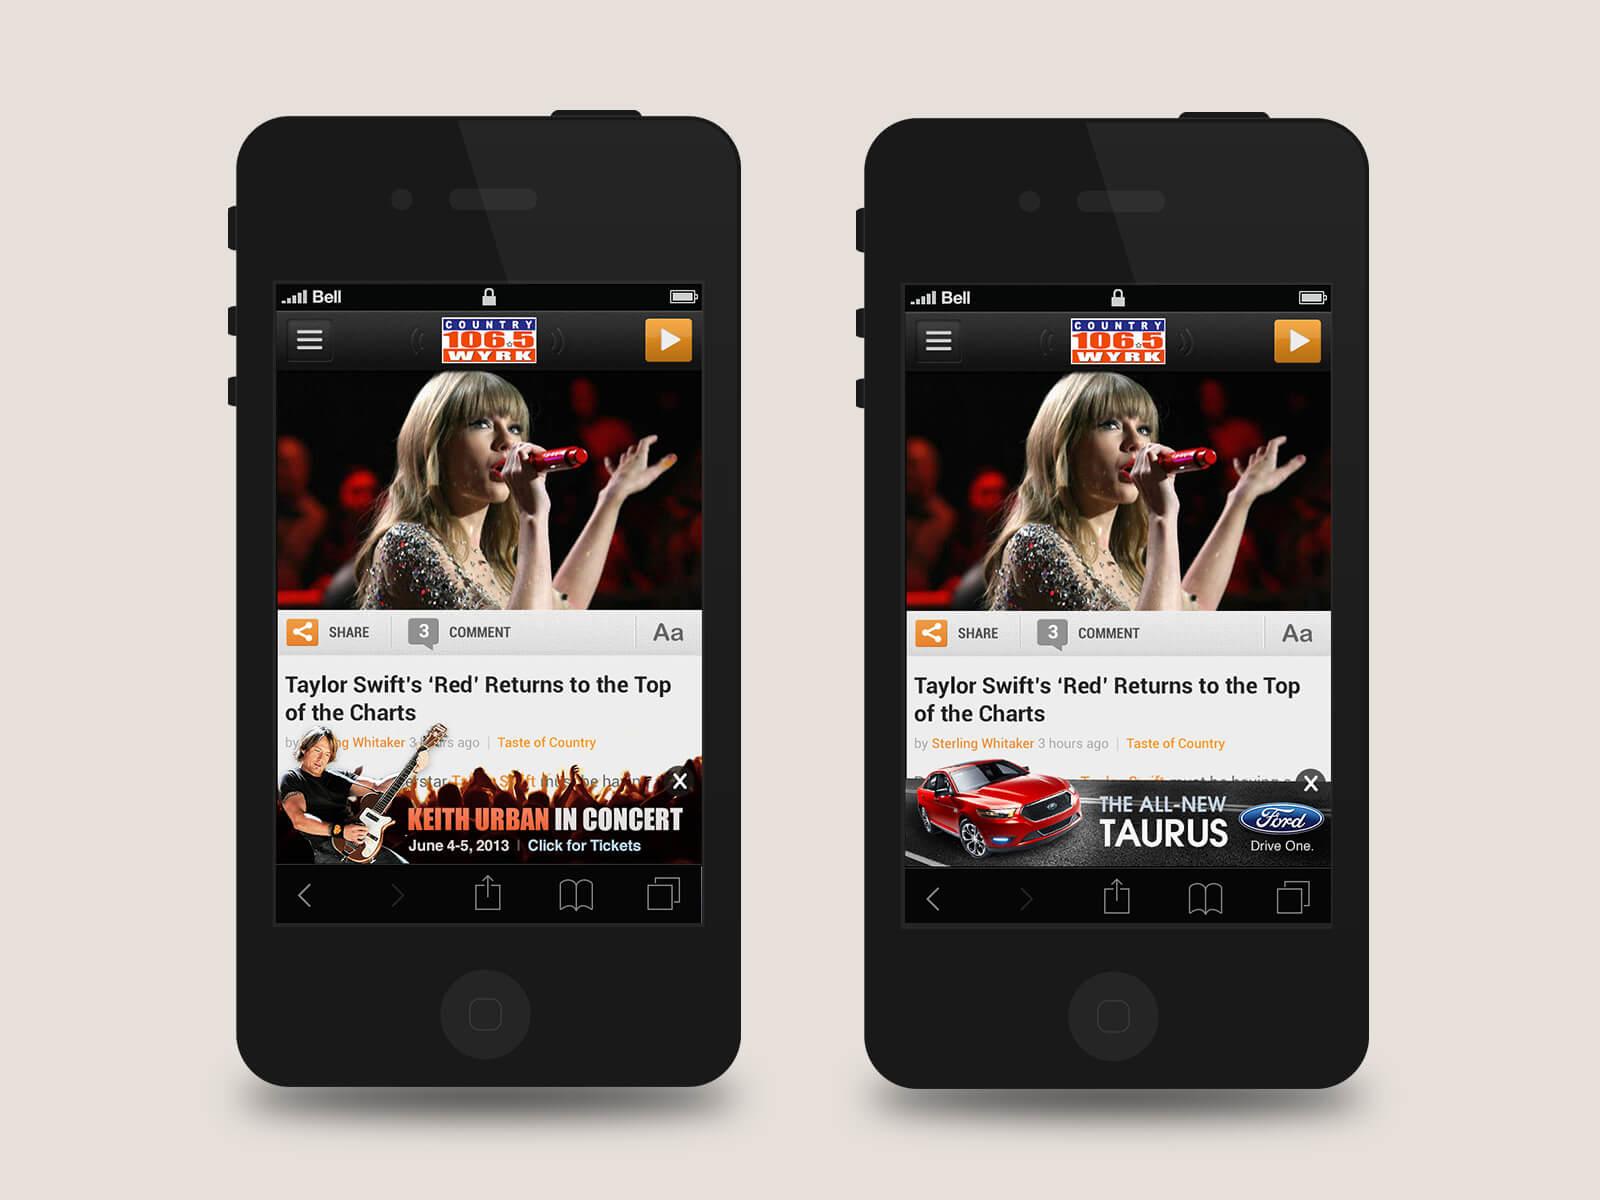 Townsquare Media - WYRK mobile native ads